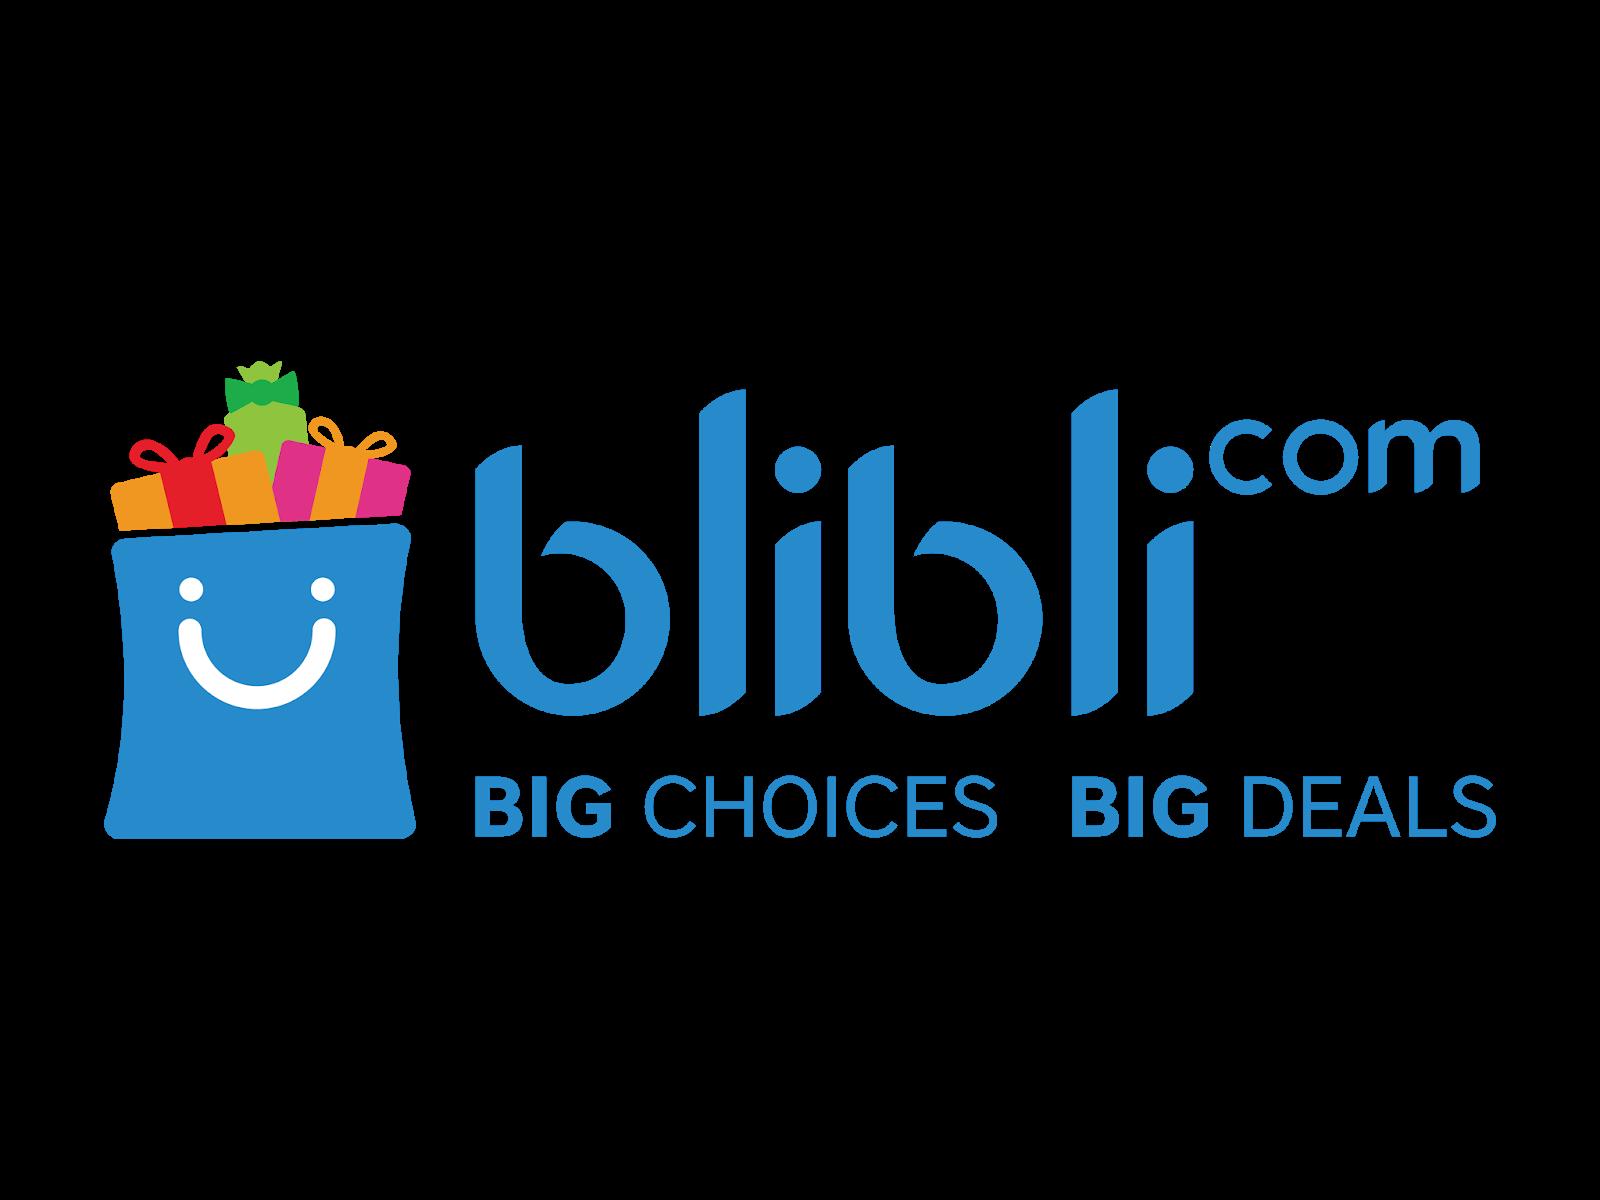 Logo Blibli.com Vector Cdr & Png HD   GUDRIL LOGO   Tempat ...